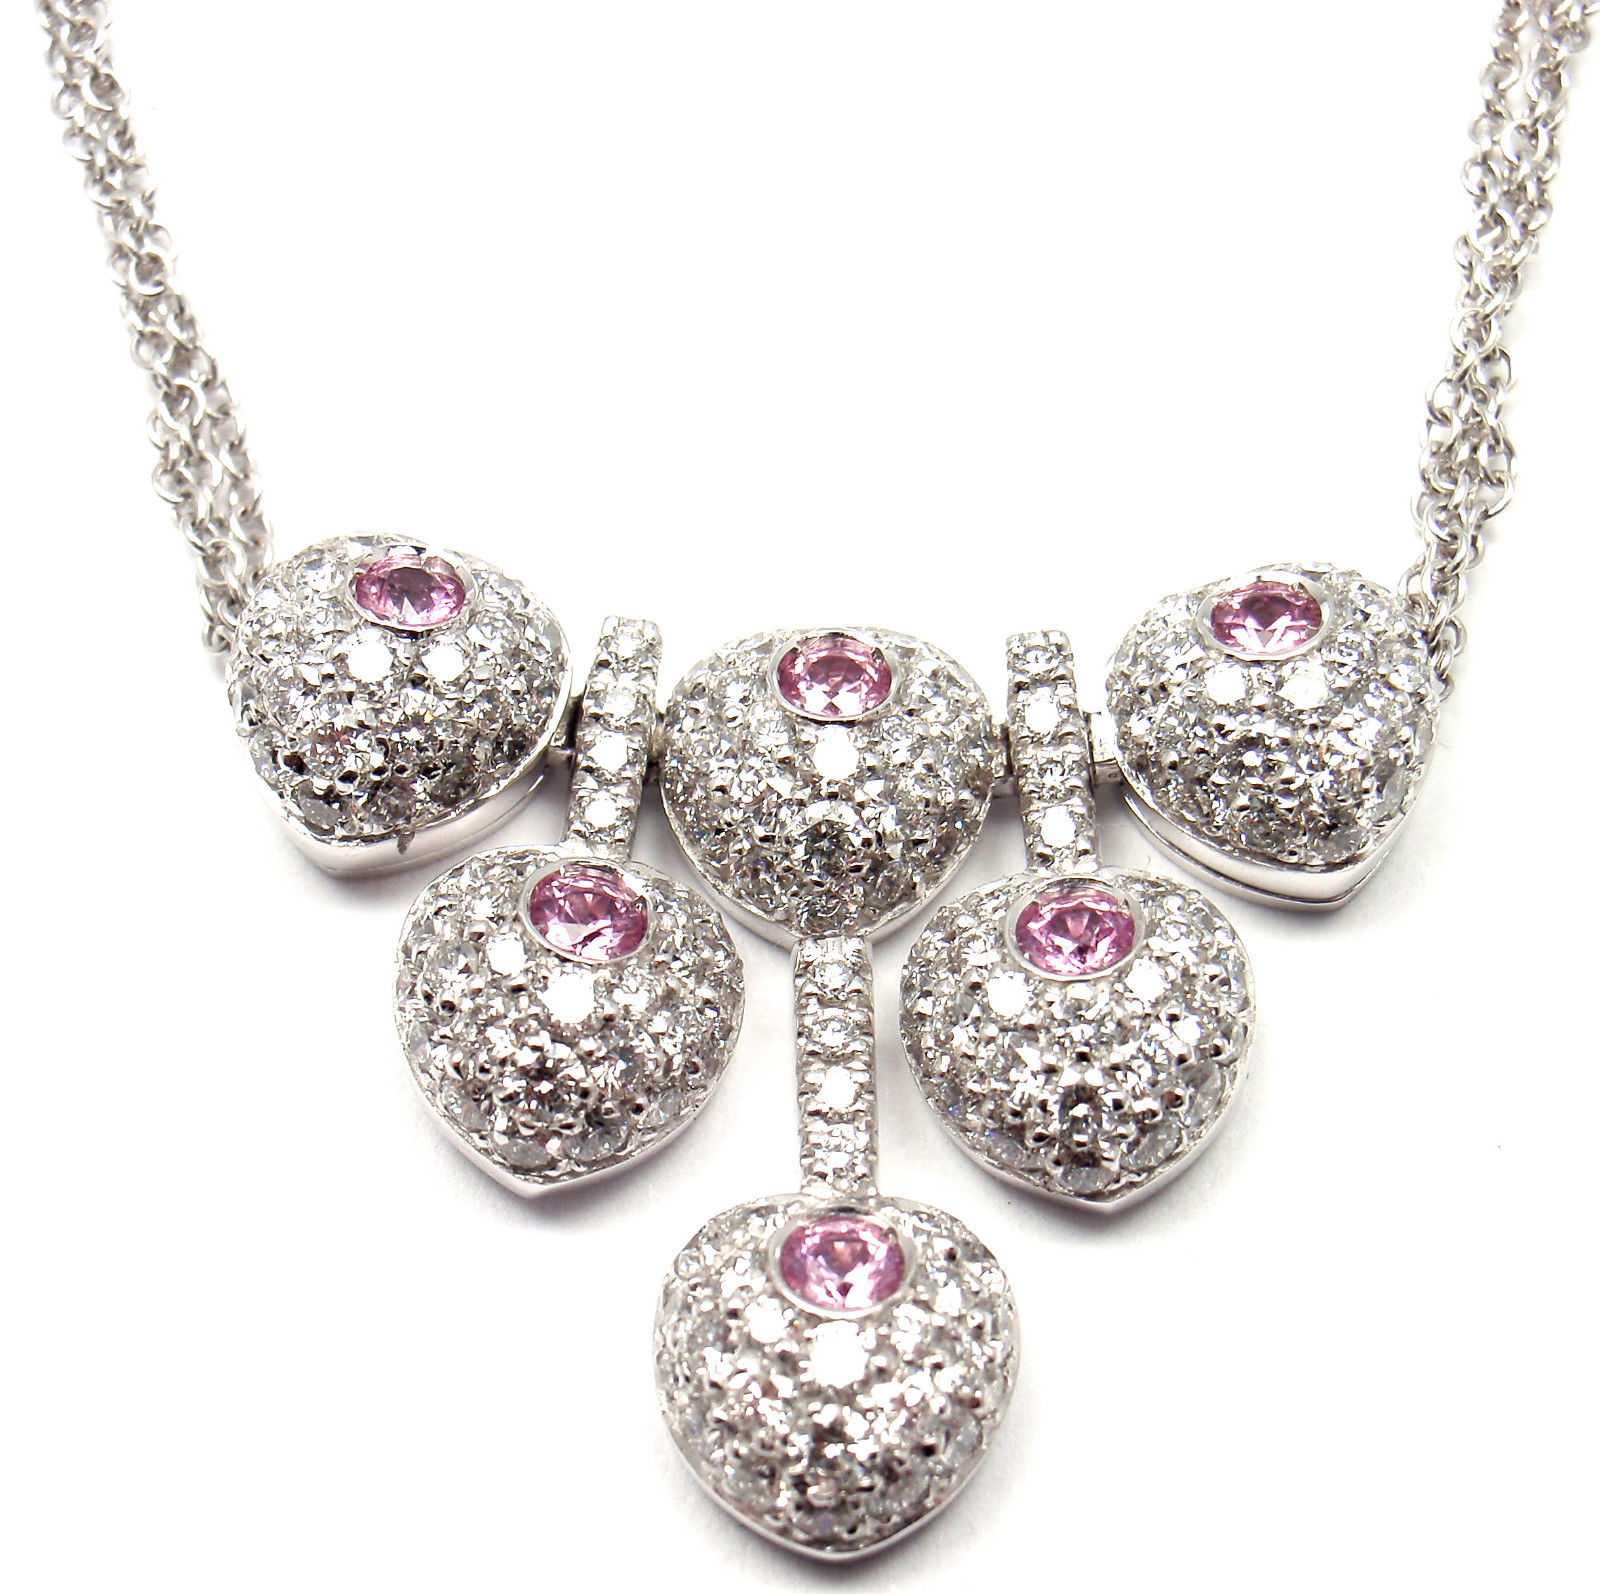 """""Pasquale Bruni 18K White Gold Diamond Sapphire Necklace"""""" 555244"